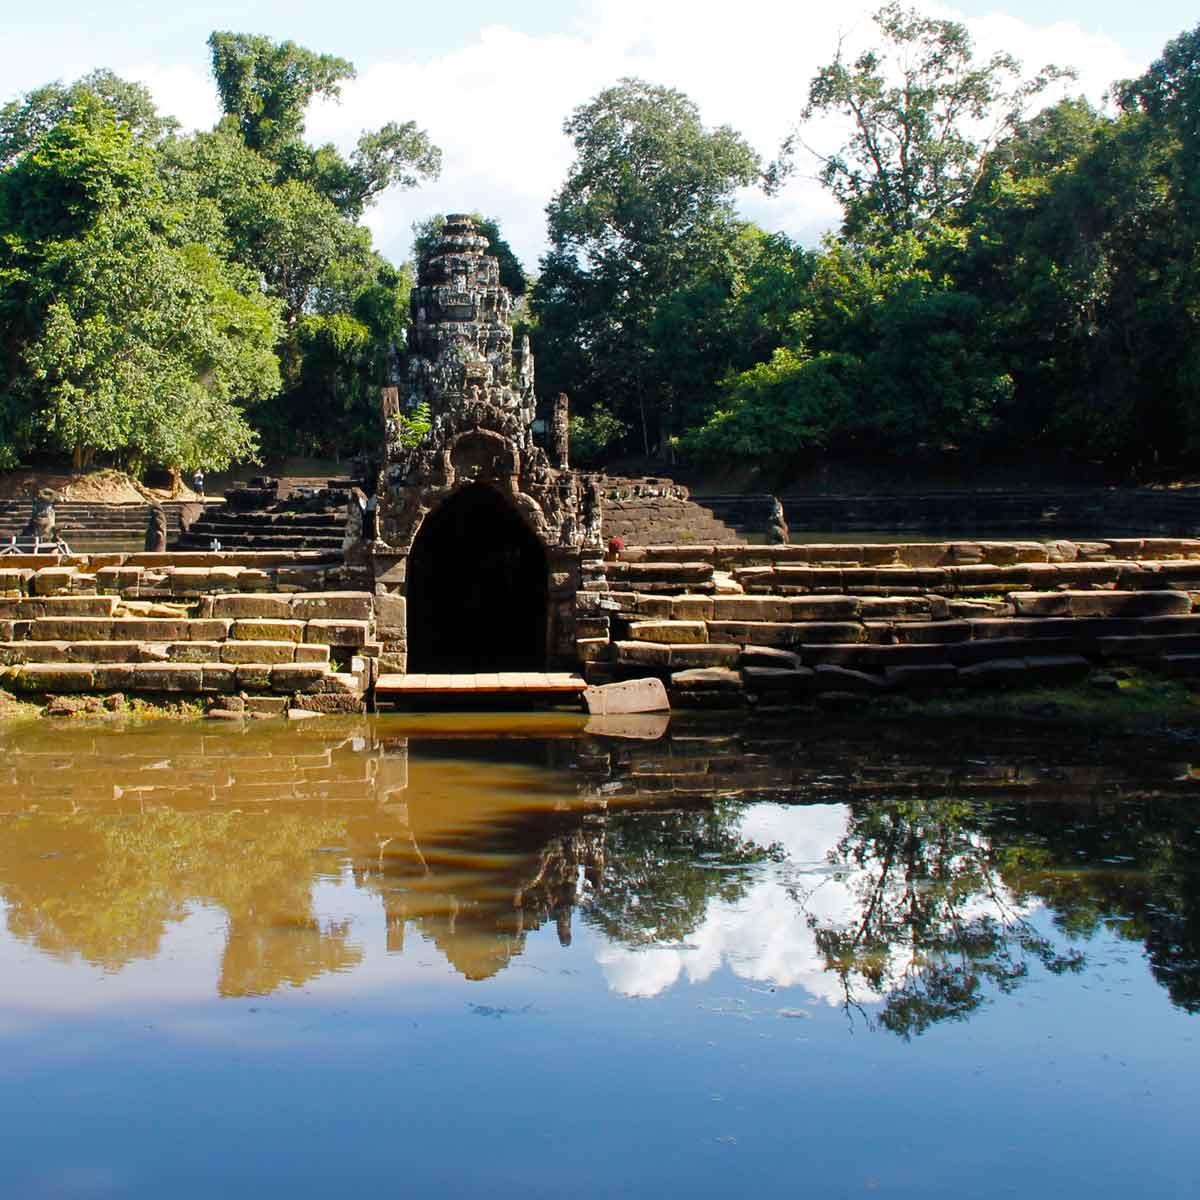 Neak Pean - Angkor Temple, Cambodia